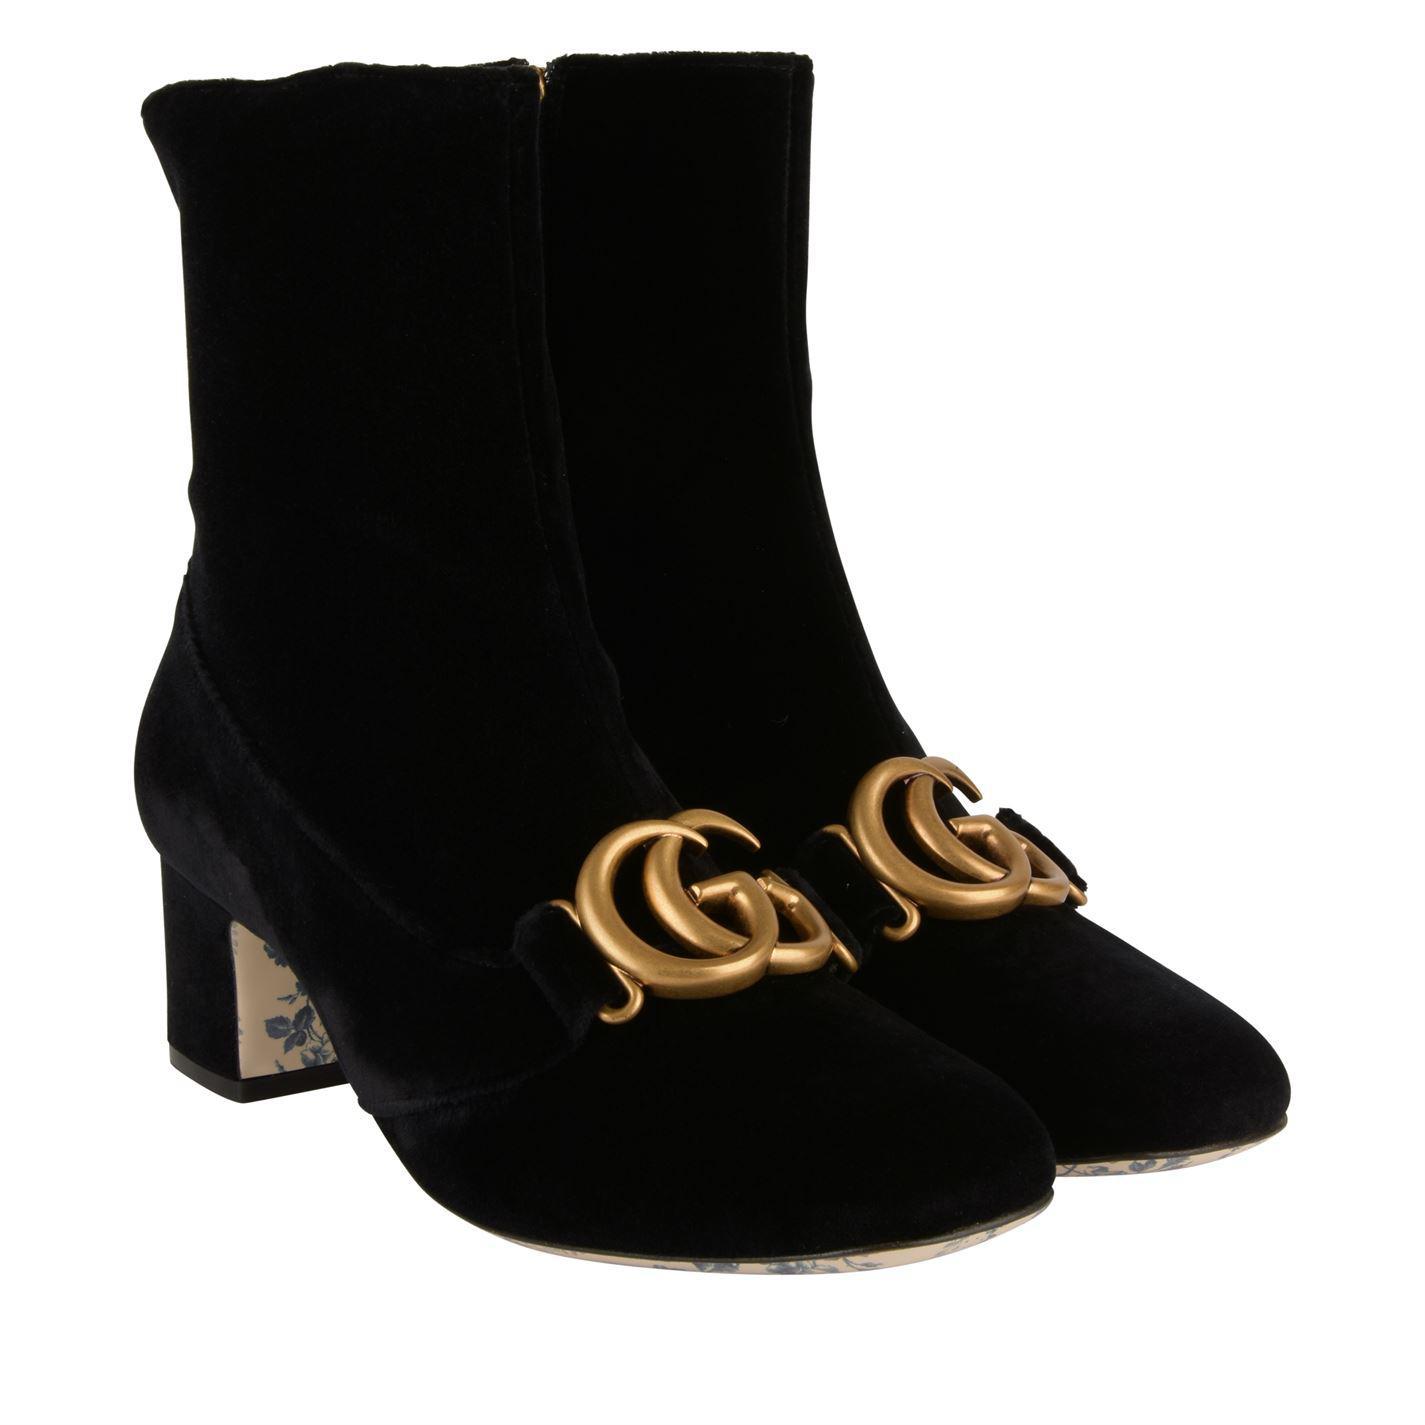 29b9f86dda9 Gucci - Black Victoire Gg Ankle Boots - Lyst. View fullscreen